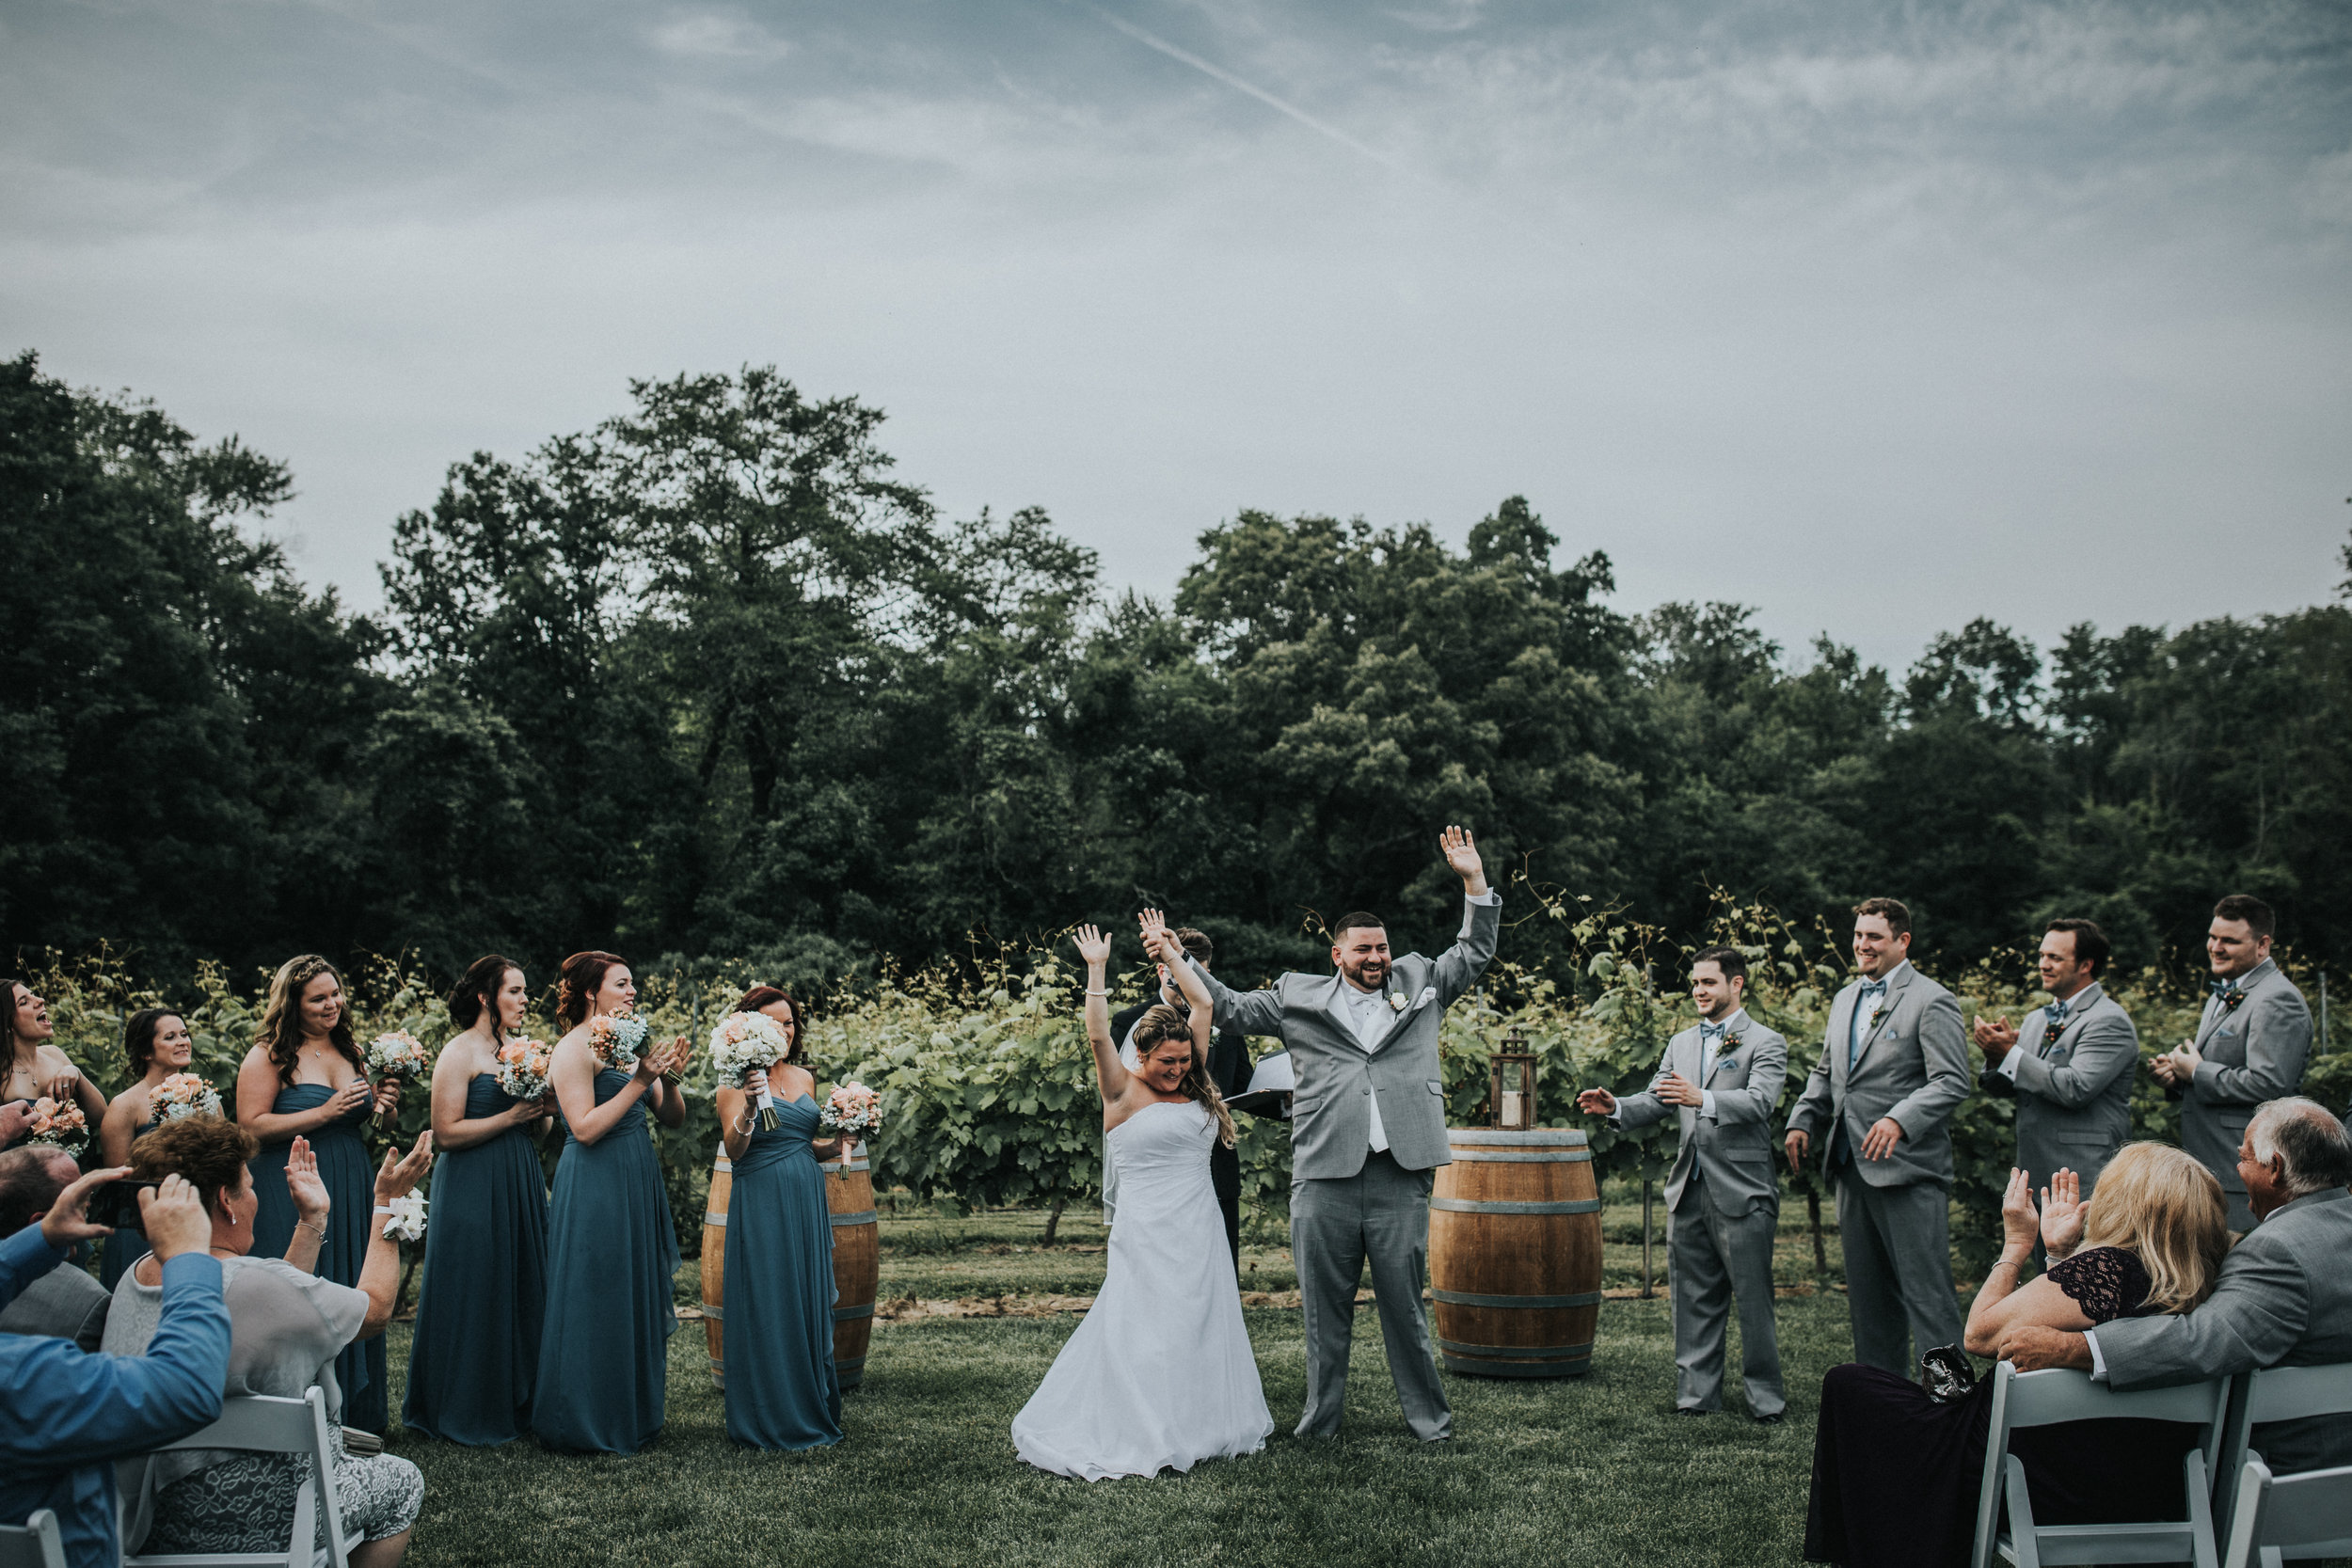 New-Jersey-Wedding-Photographer-JennaLynnPhotography-ValenzanoWinery-Ceremony-66.jpg